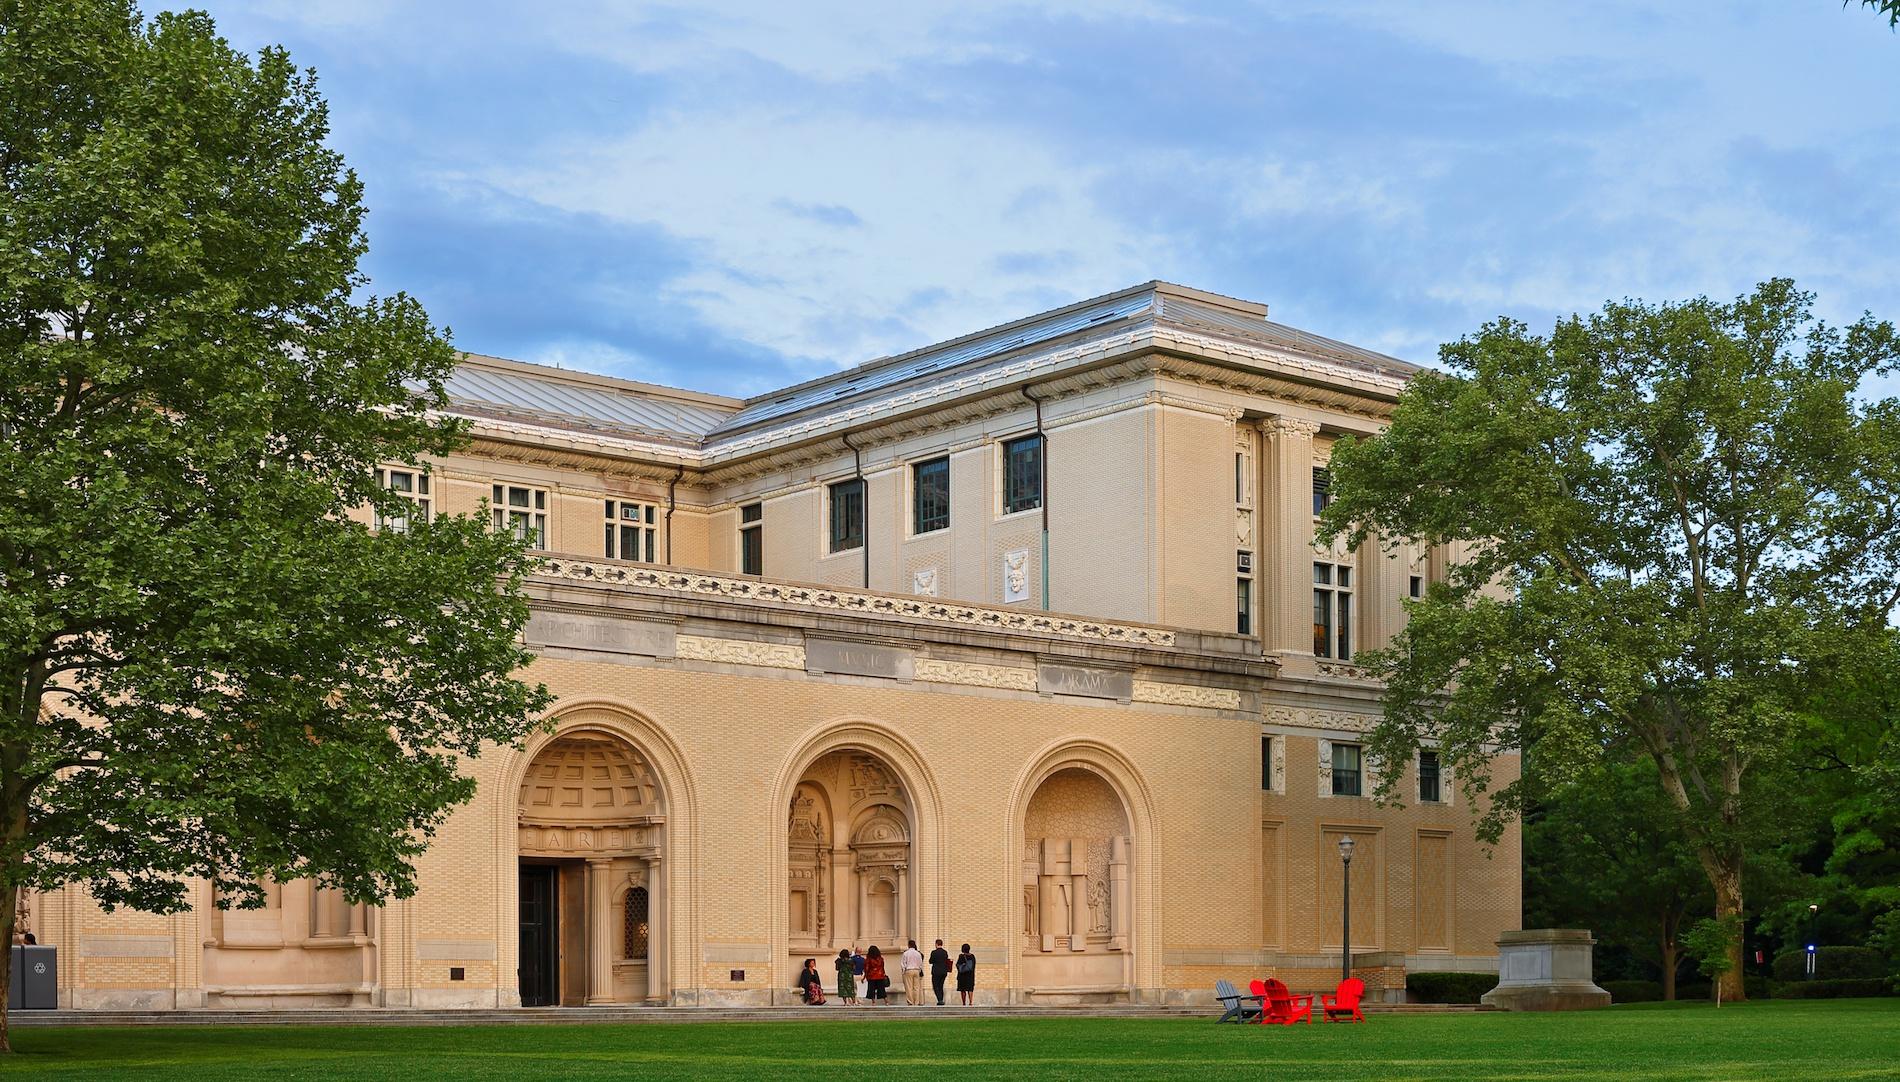 CMU's Director of Enrollment Breaks Down the Drama School's Application Process